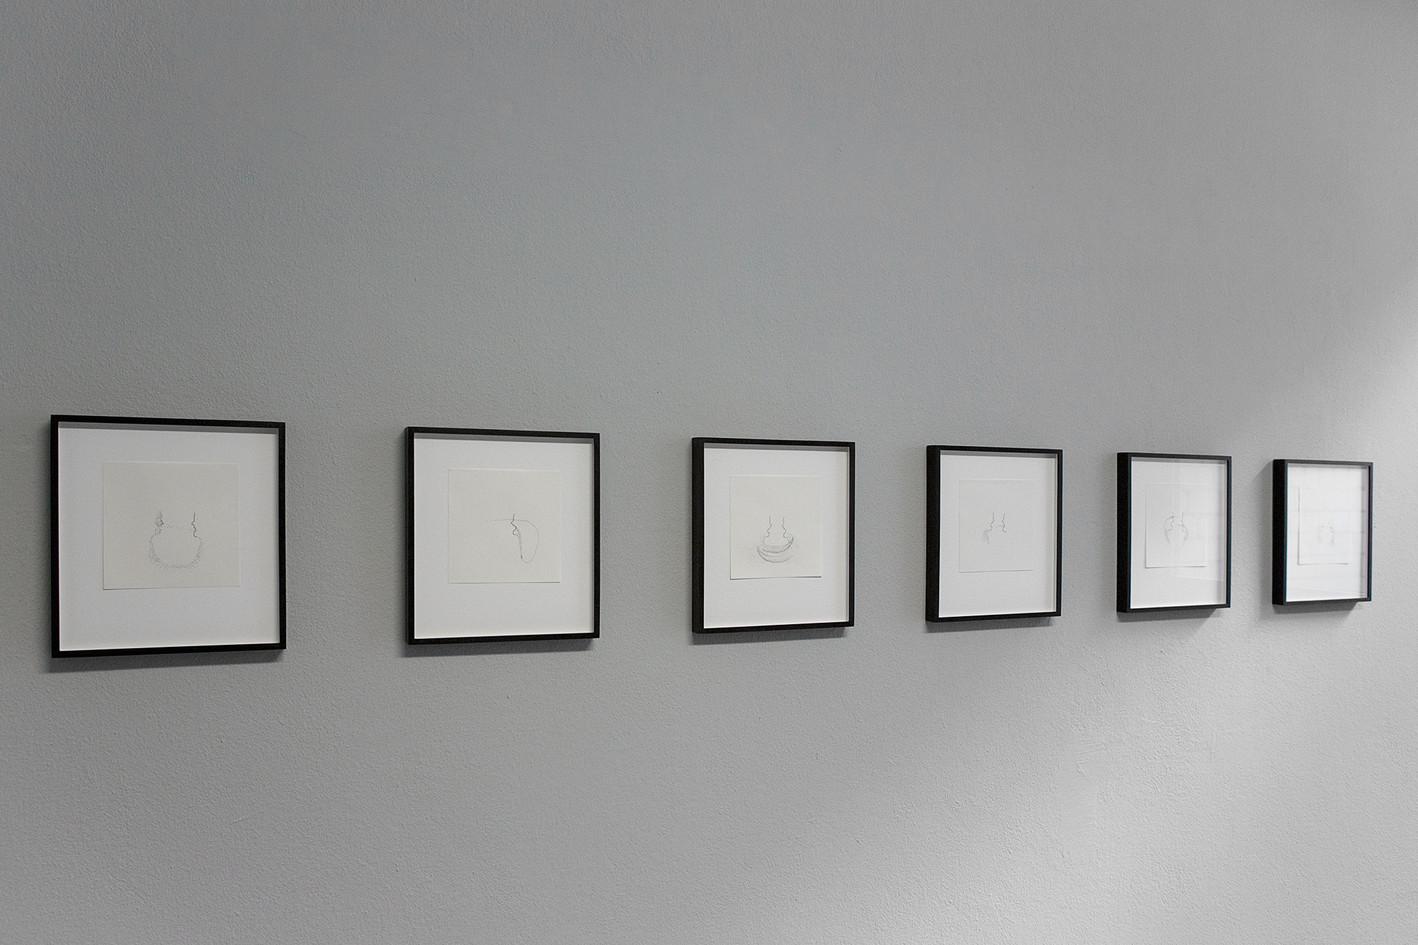 Kirstin Burckhardt, gorge, 1 – 6, 2020; Ink / 70g/m2 Paper,  15 x 15 cm each © Mirjana Vrbaski